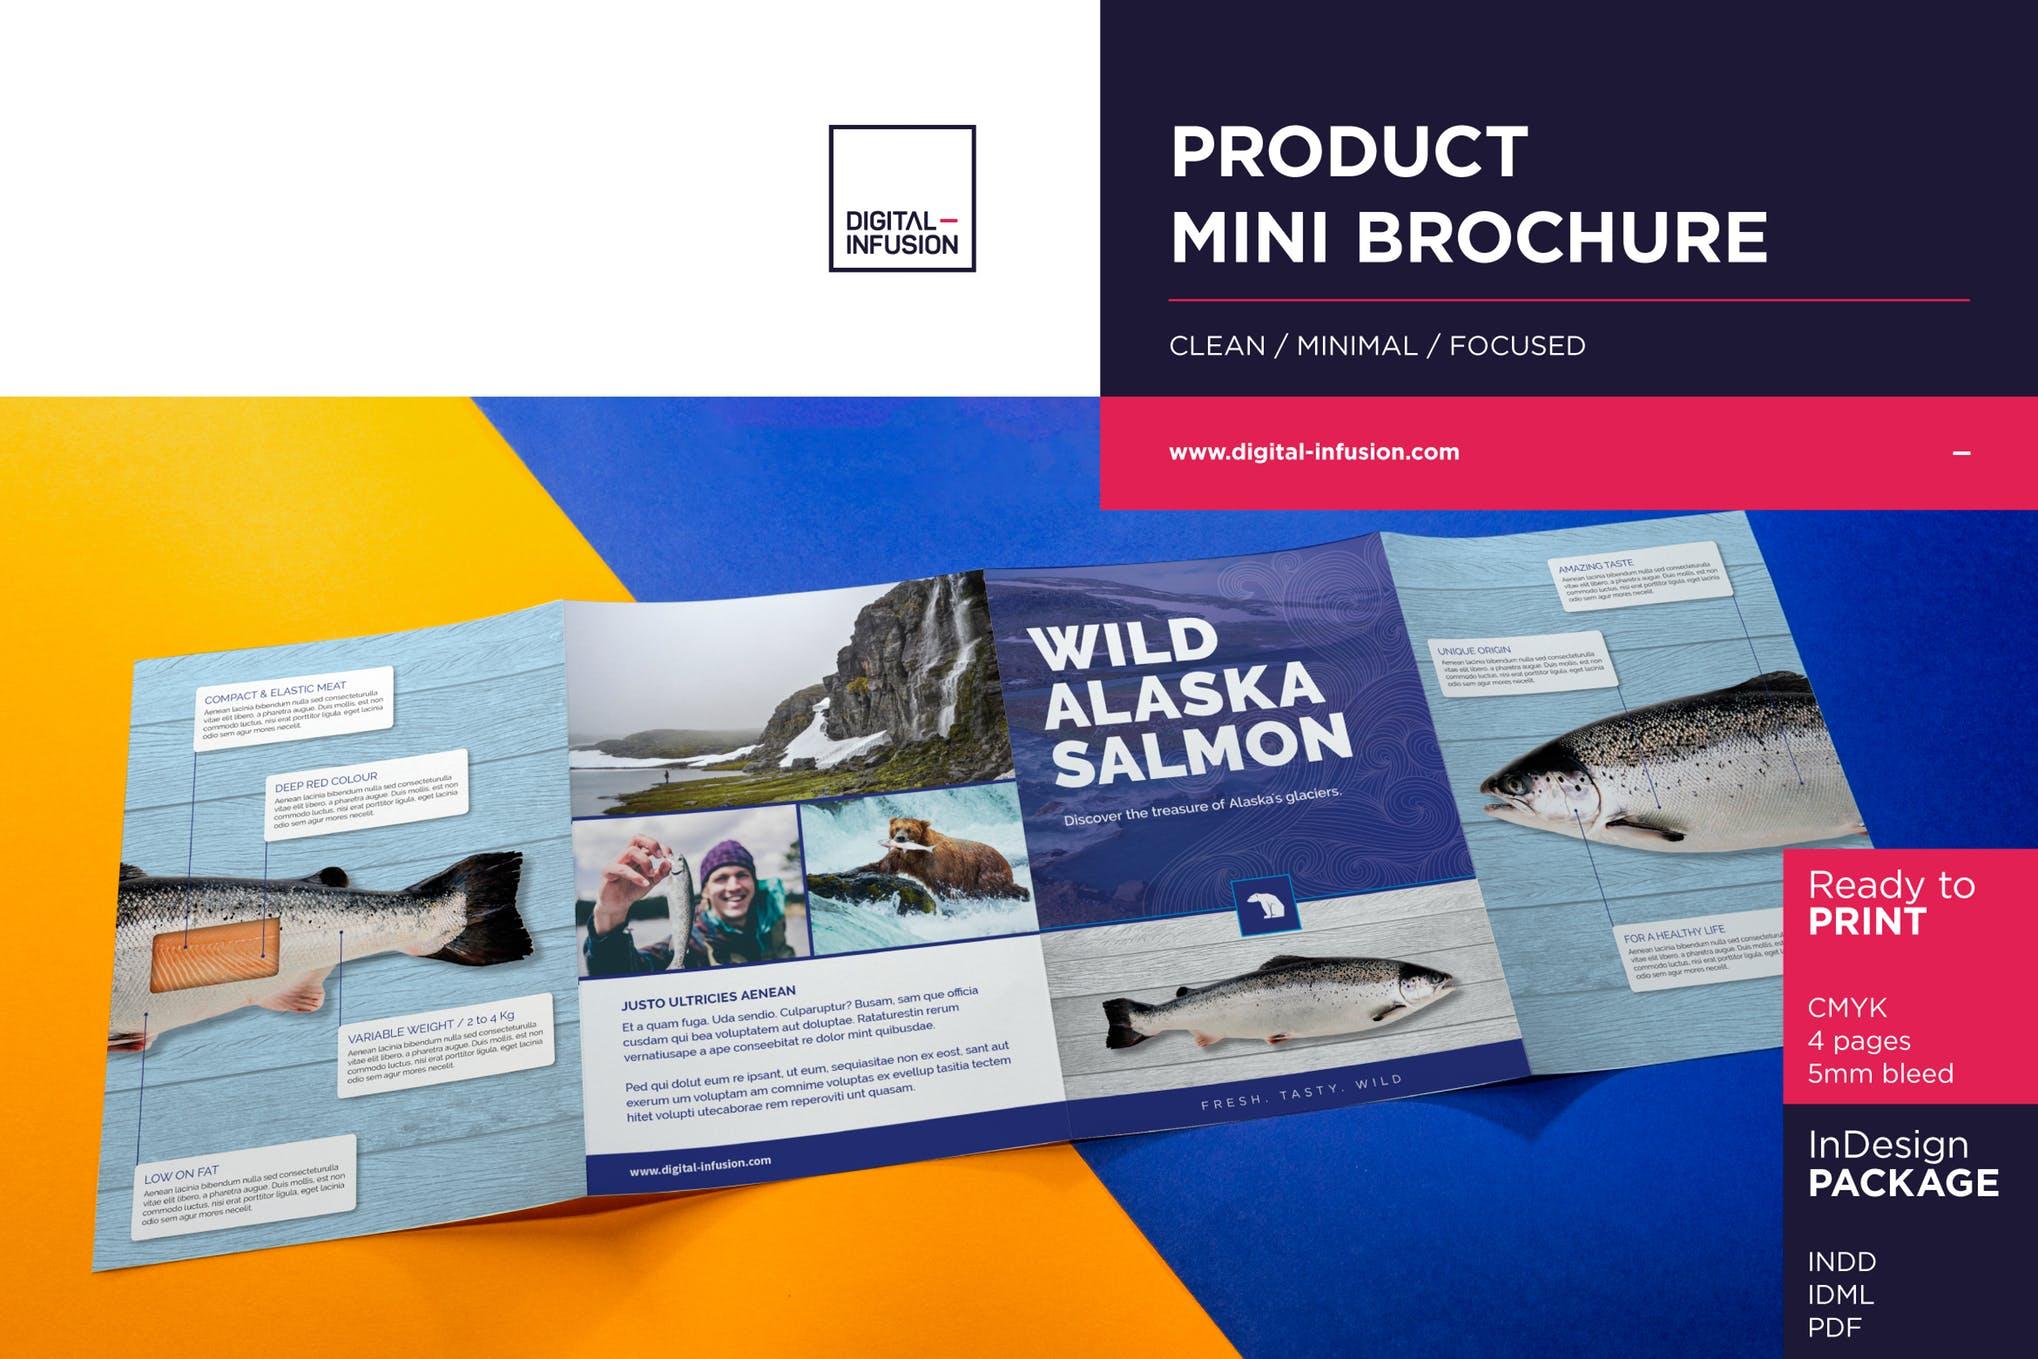 Product Mini Brochure template